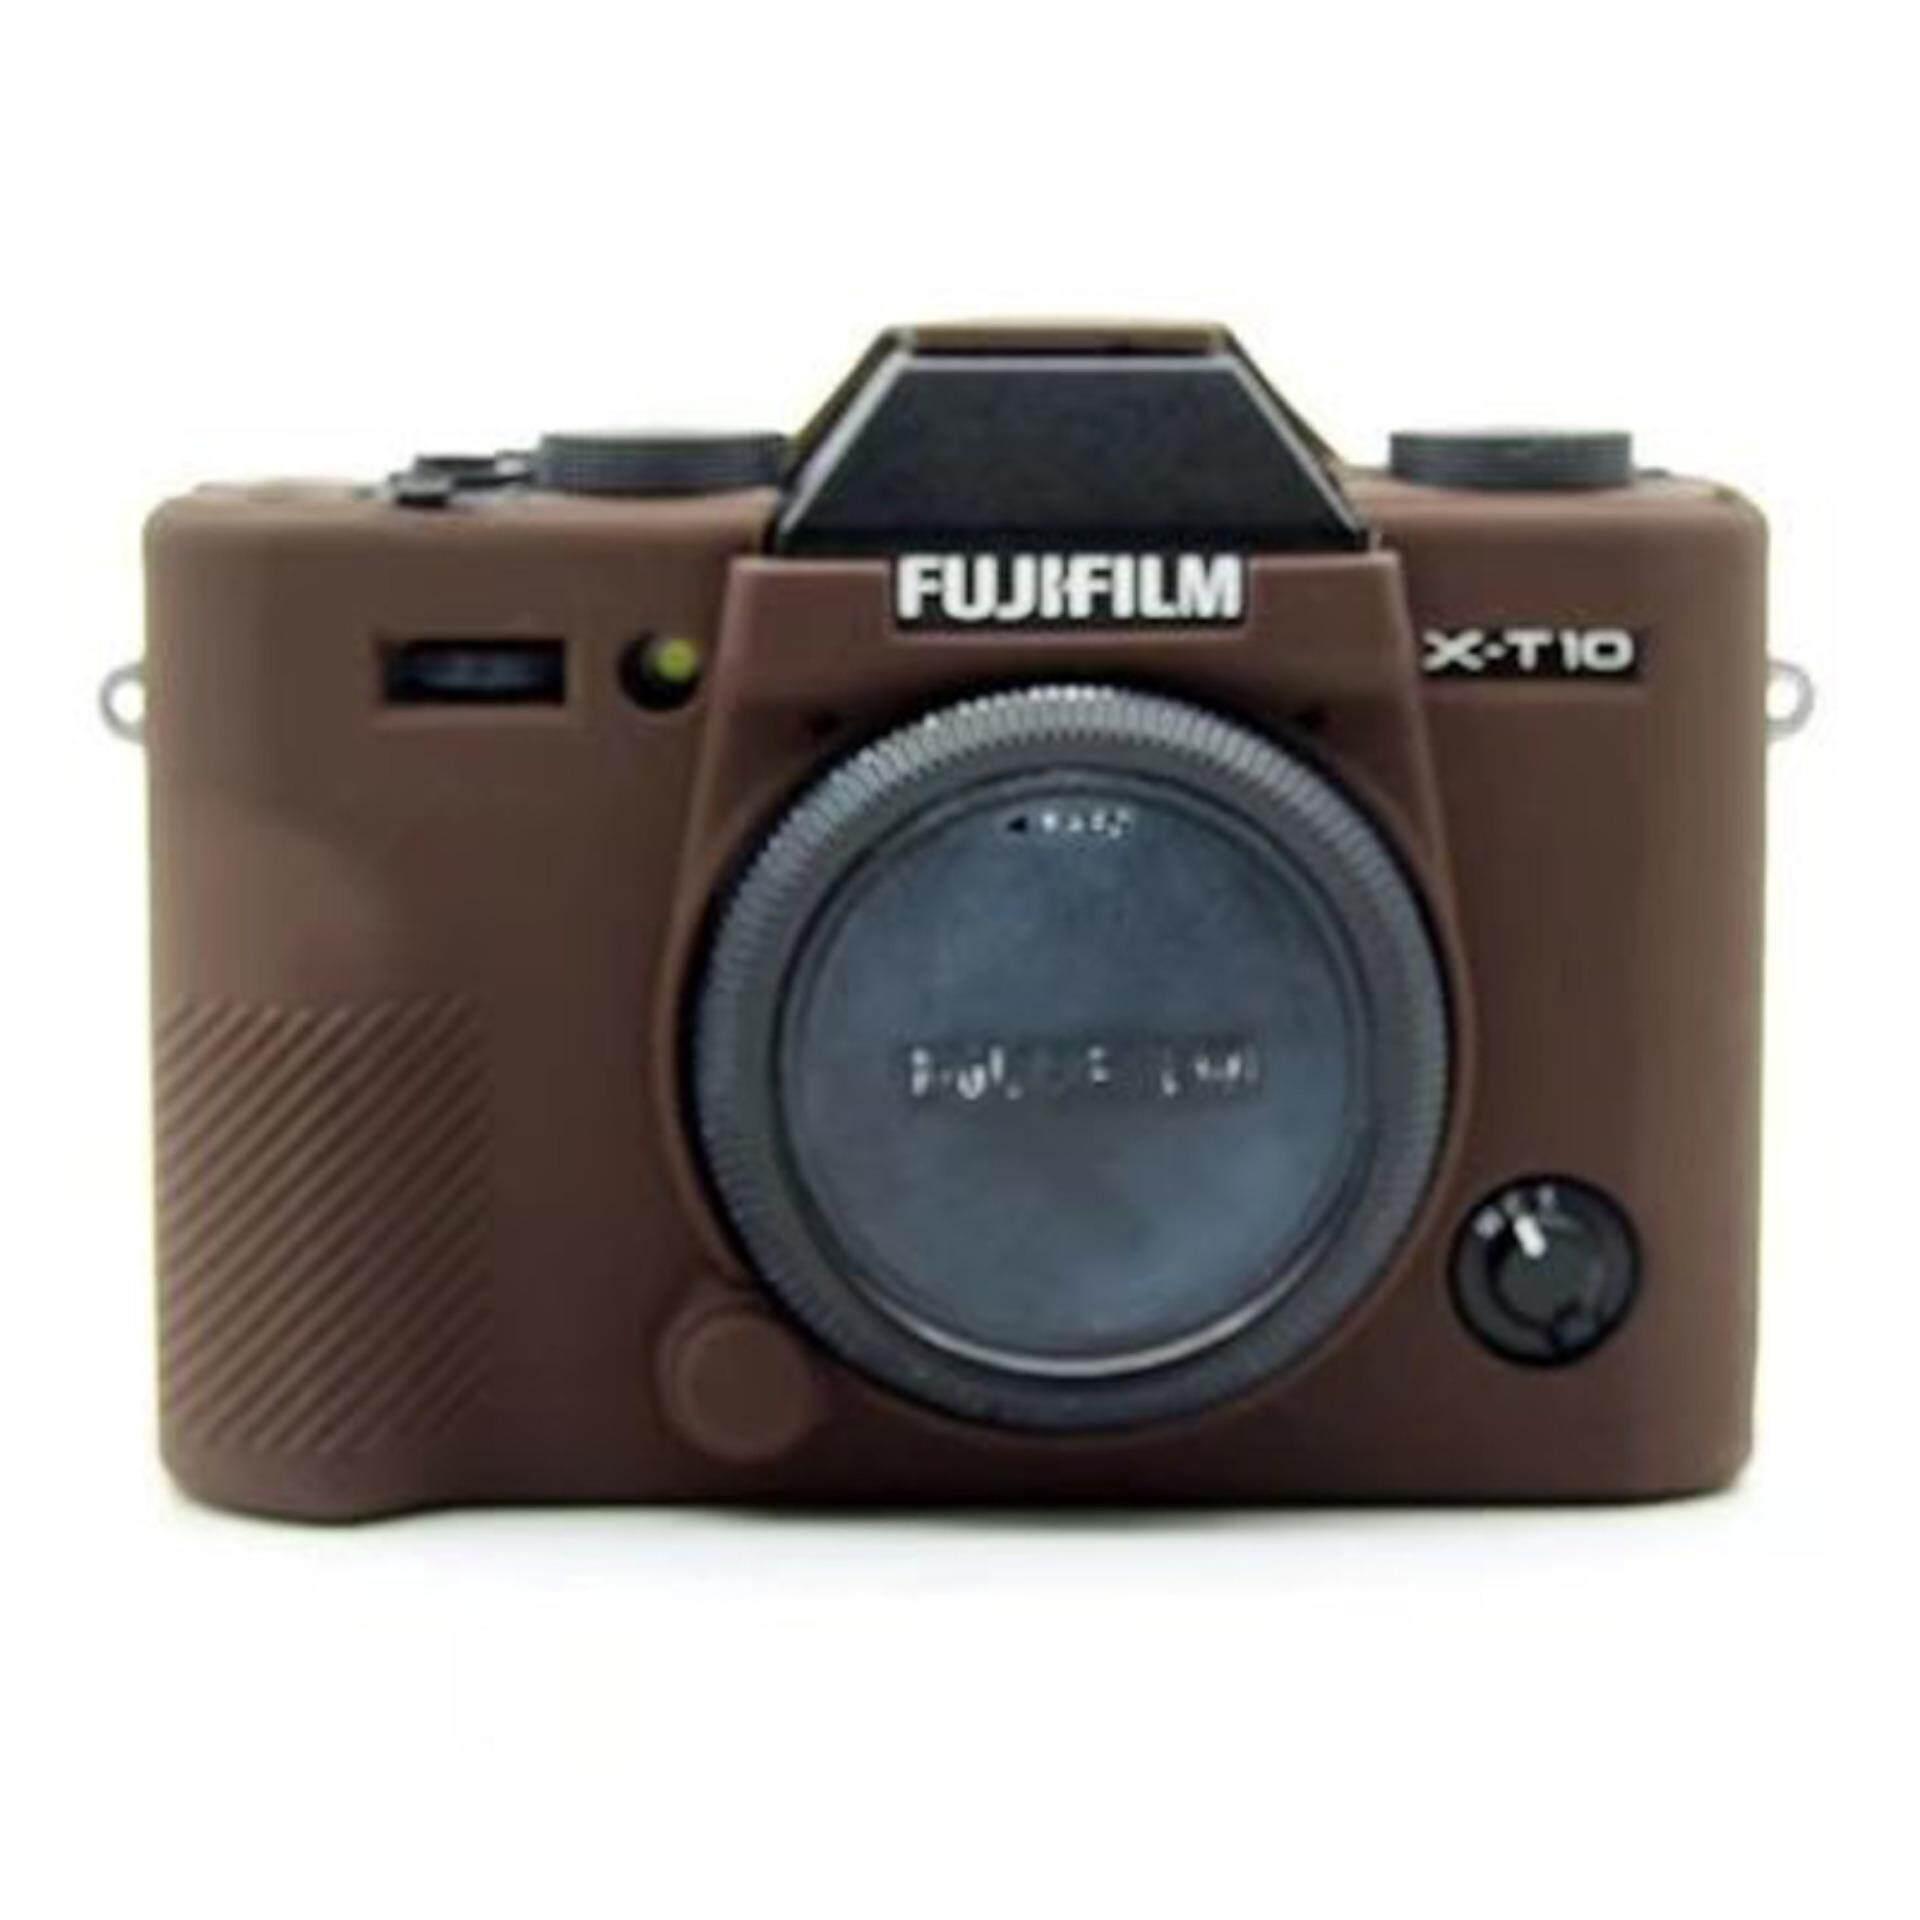 Soft Silicone Protector Skin Case Bag for Fujifilm Fuji X-T10 X-T20 XT10 XT20